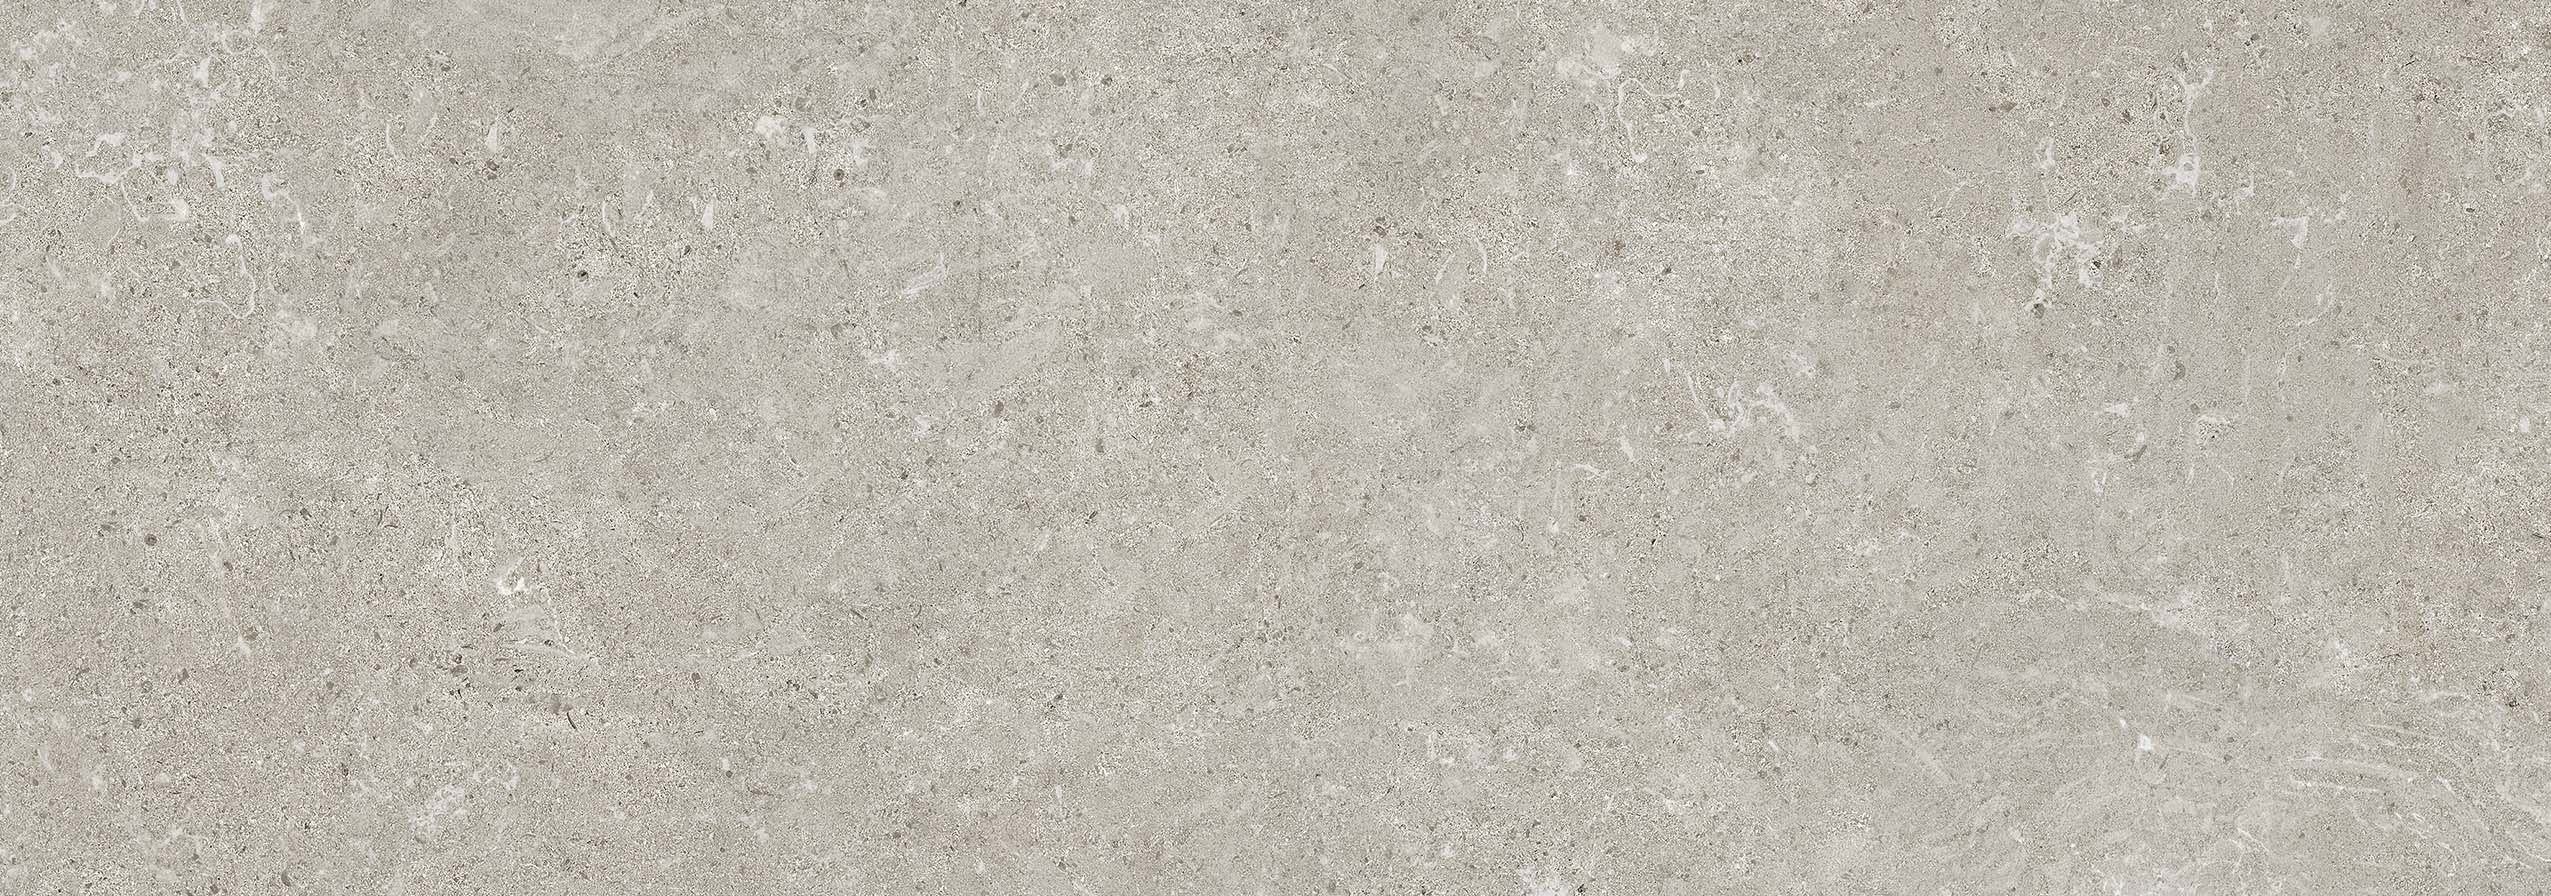 Astoria Gris Ceramic Wall Tile 316x900mm Astoria Ceramic Wall